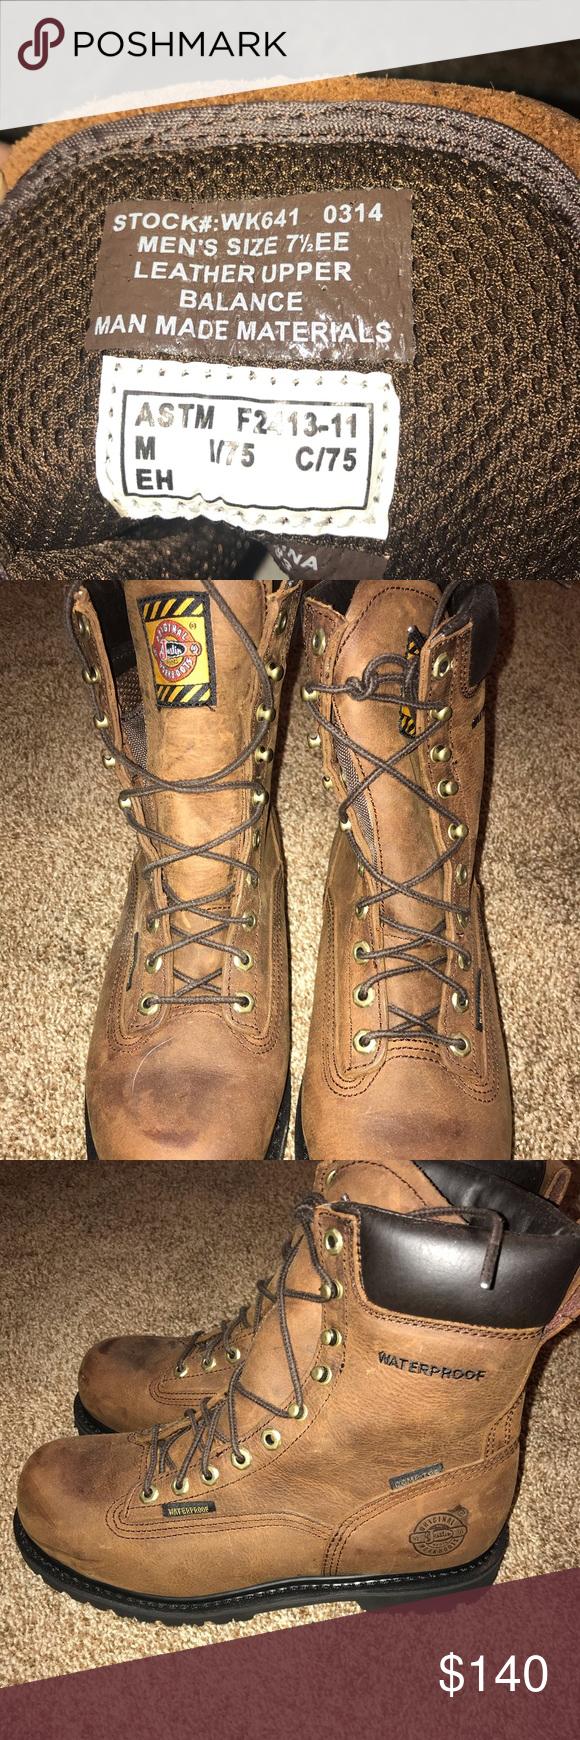 Justin Original Men S Lace Up Work Boots Nwot In 2020 Justin Work Boots Fashionable Snow Boots Boots